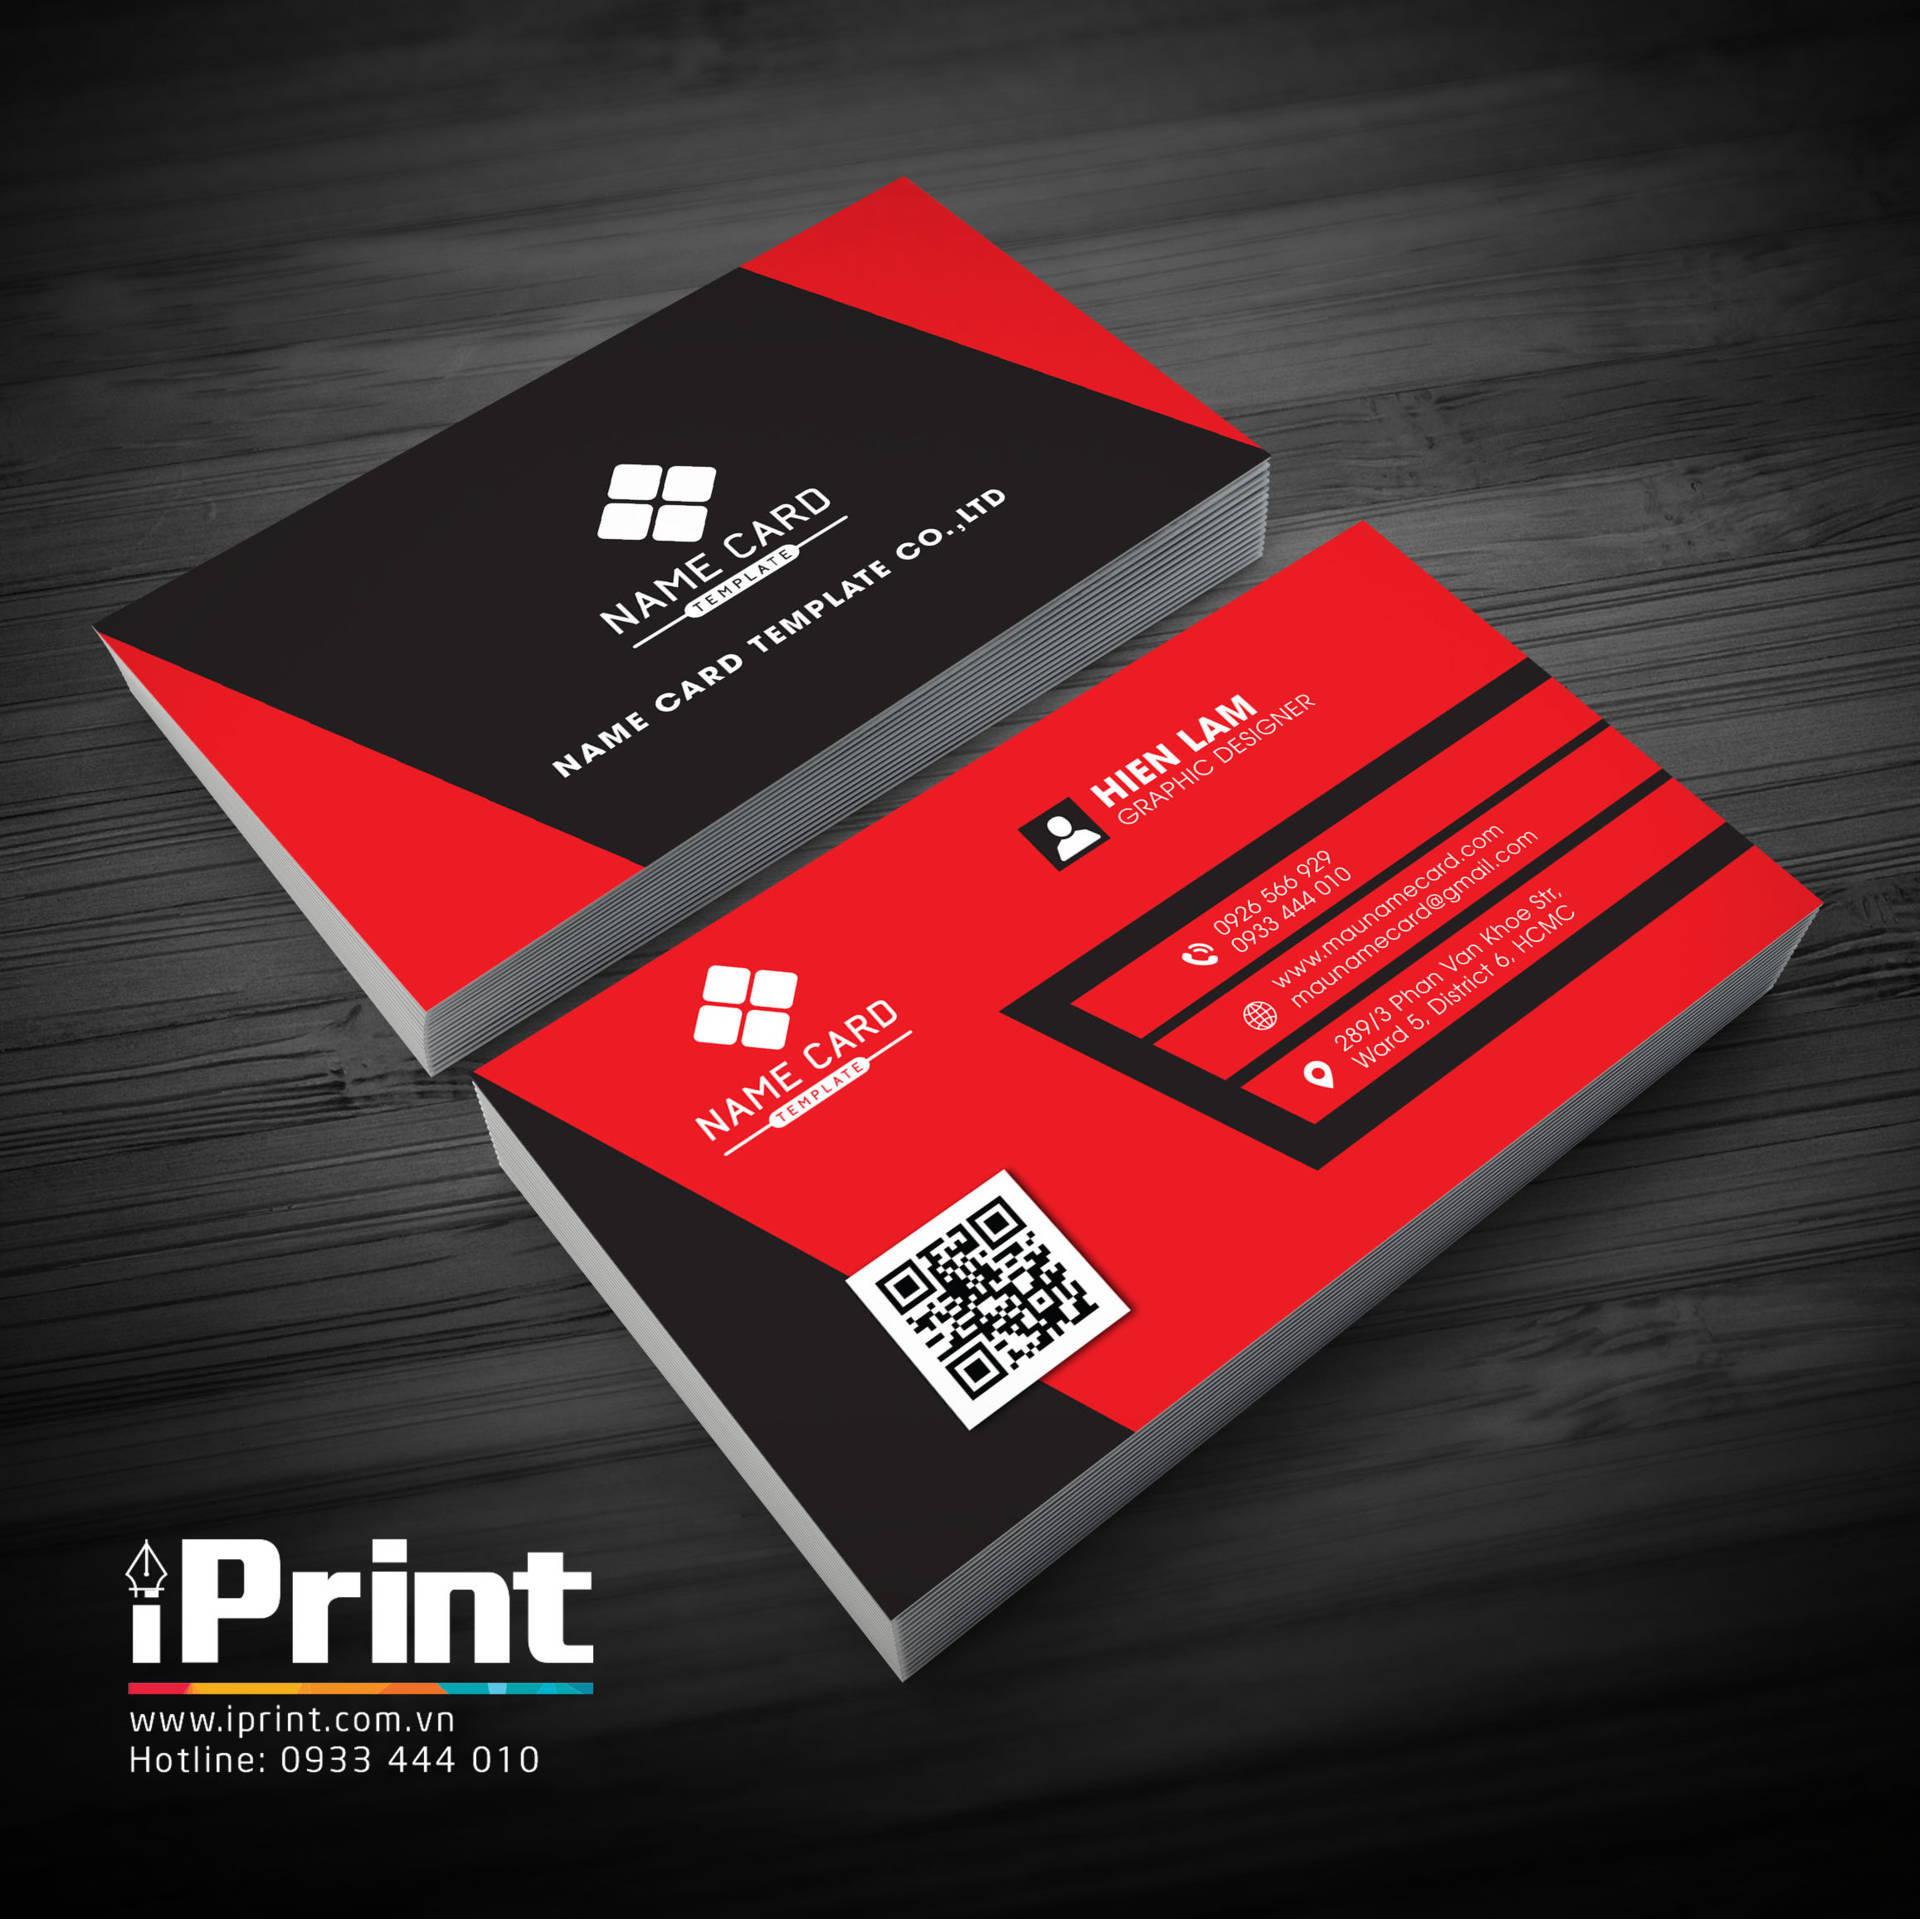 name card kinh doanh (182)